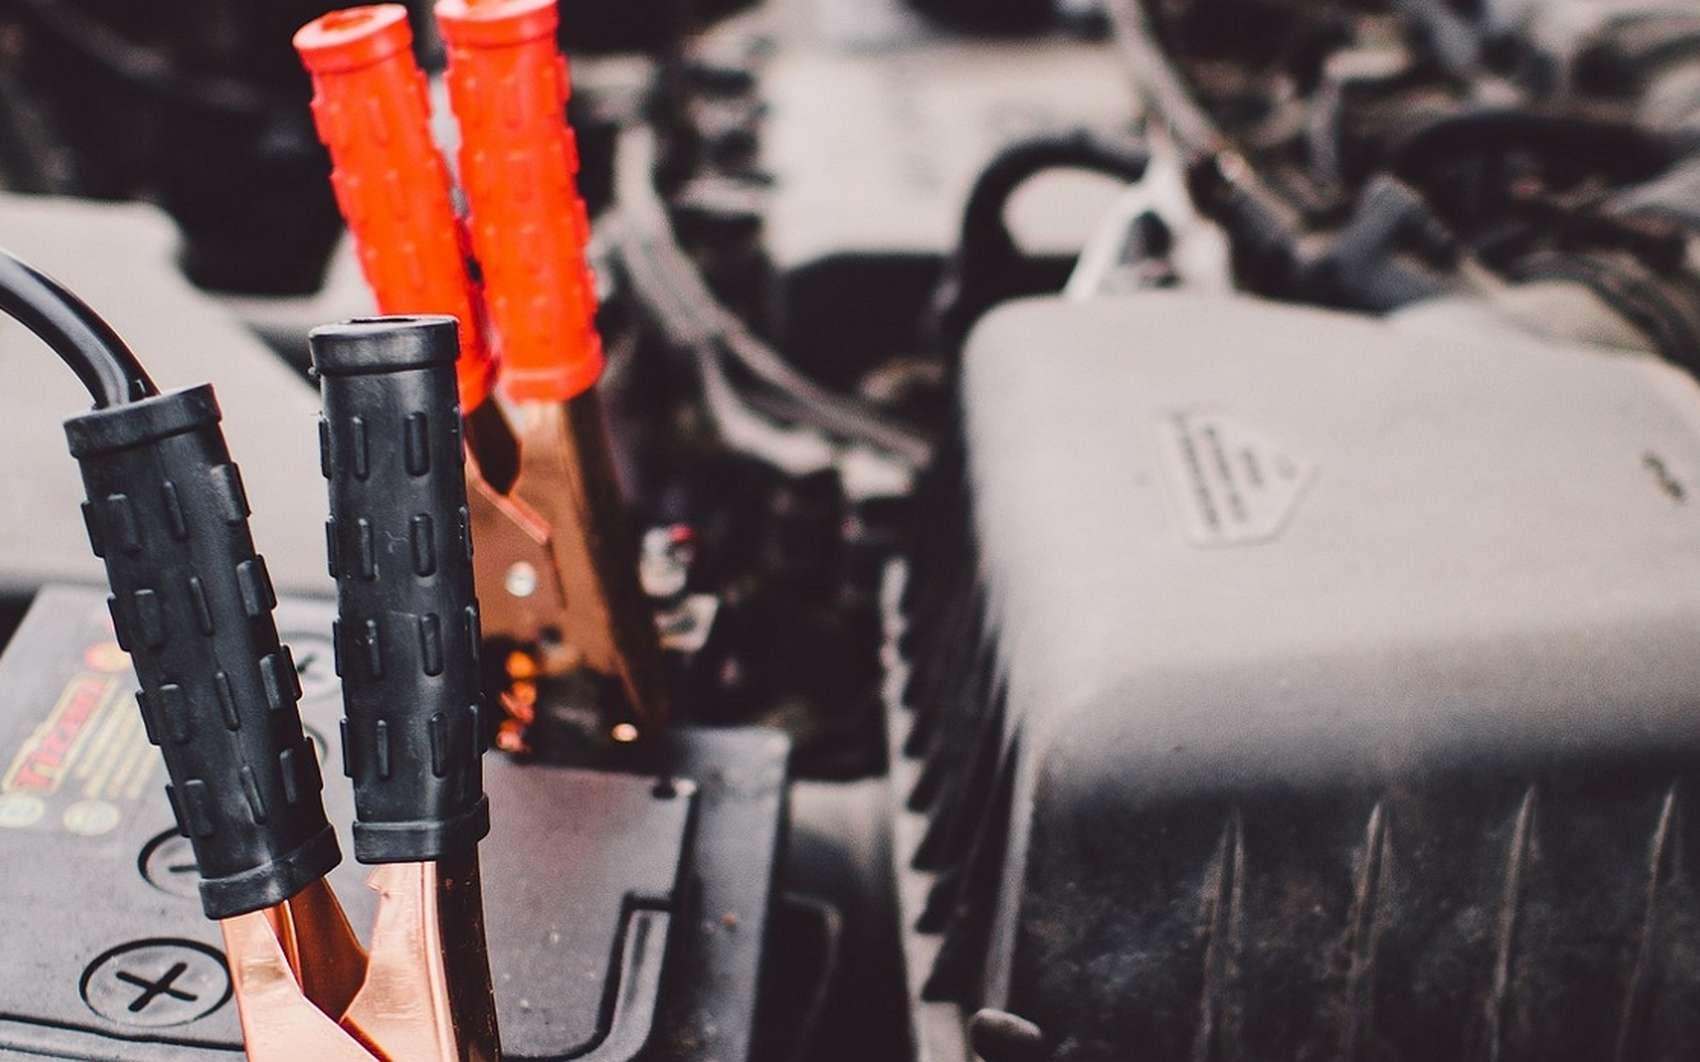 Batterie de voiture © StockSnap, Pixabay